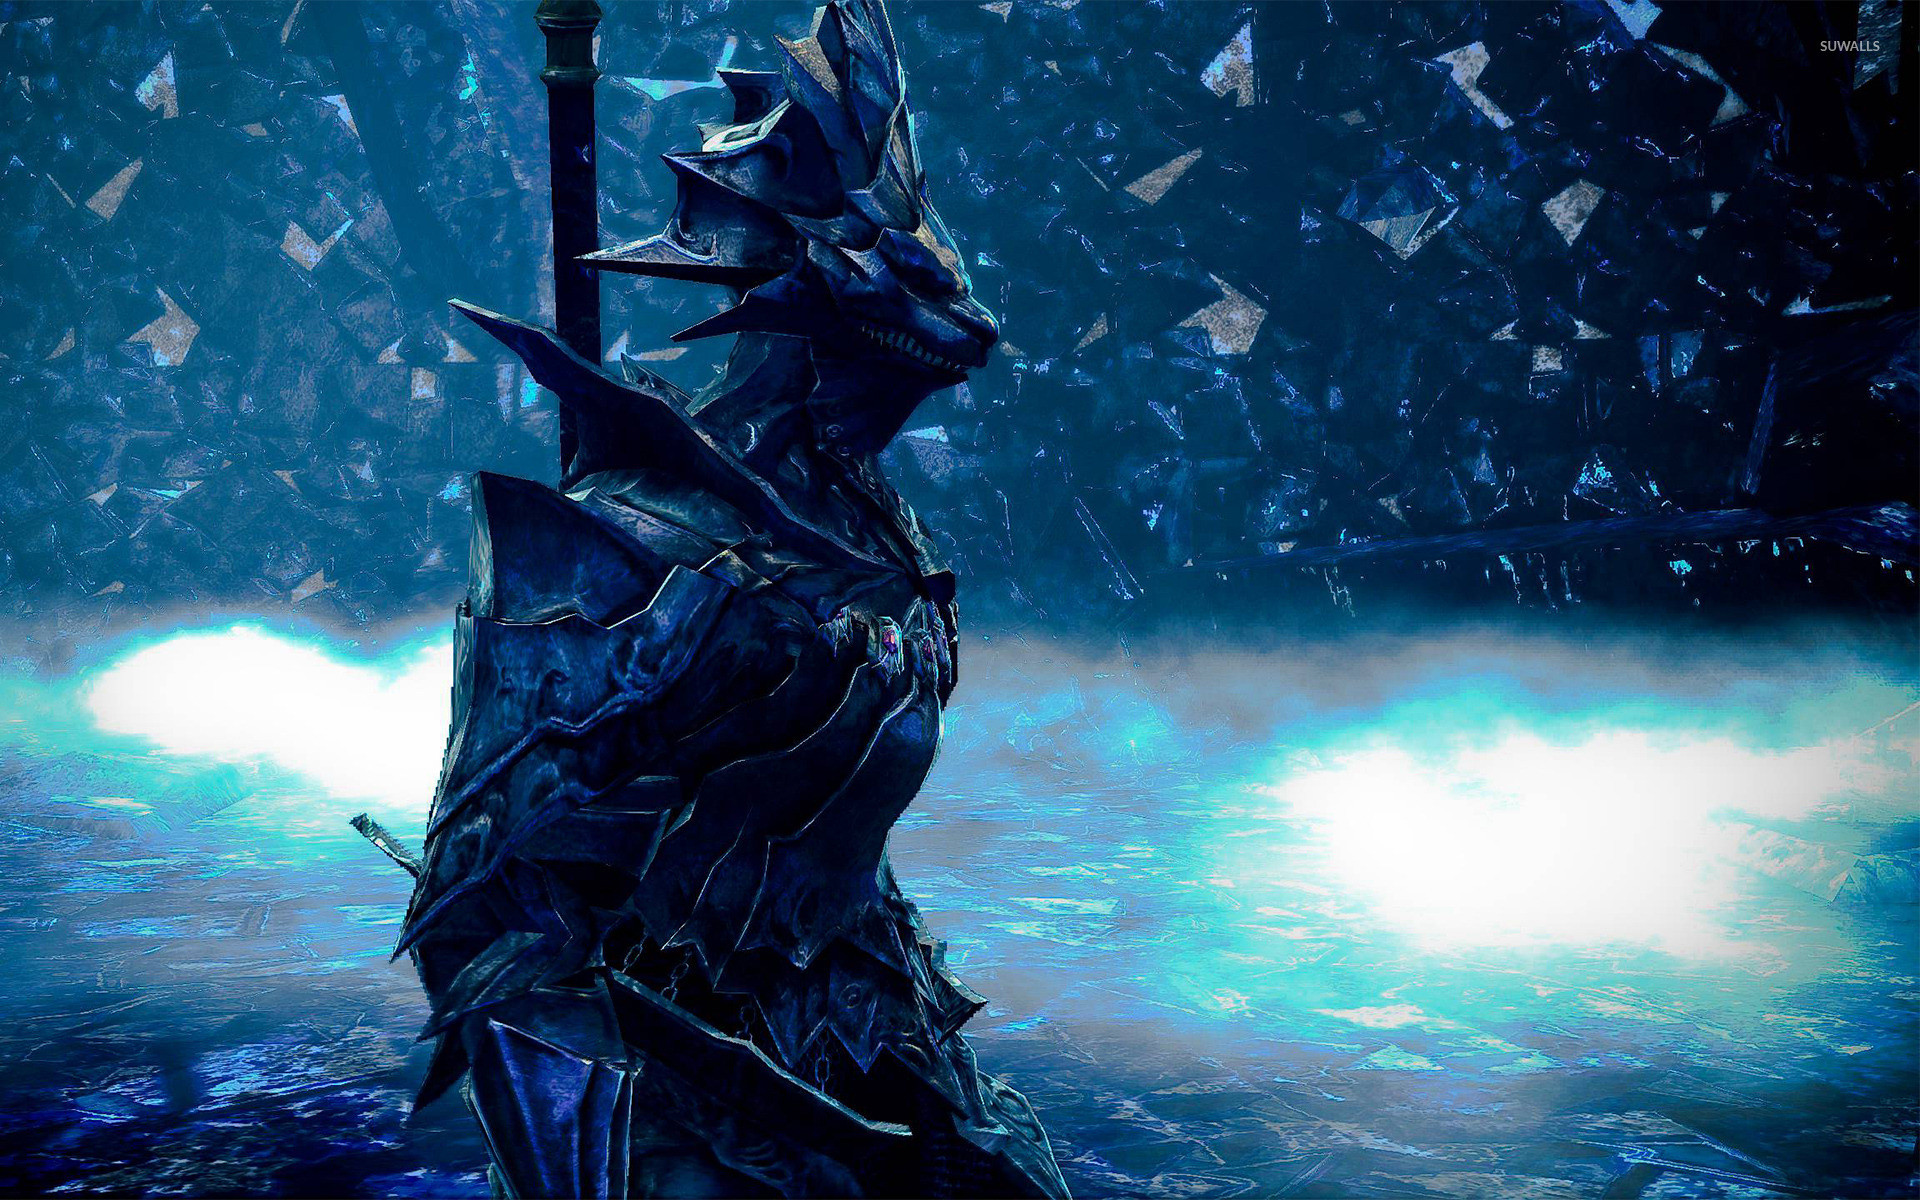 Dark Souls 3 Ps4 Wallpaper